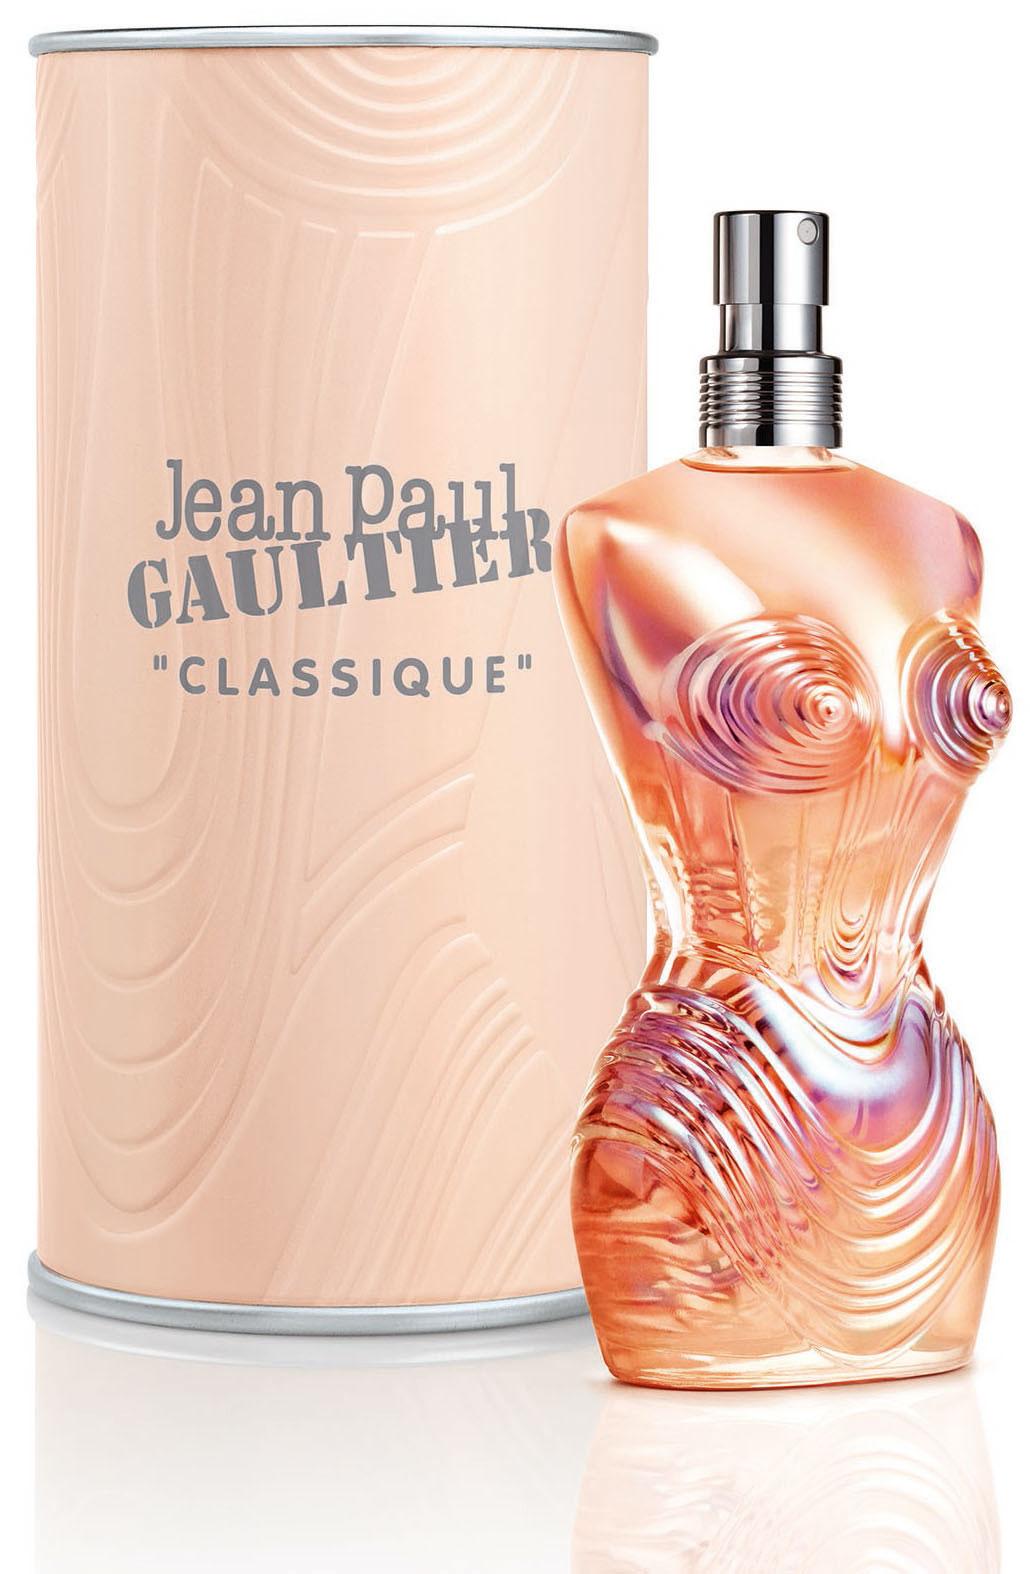 Jean Paul Gaultier Classique Belle en Corset Bottle.jpg